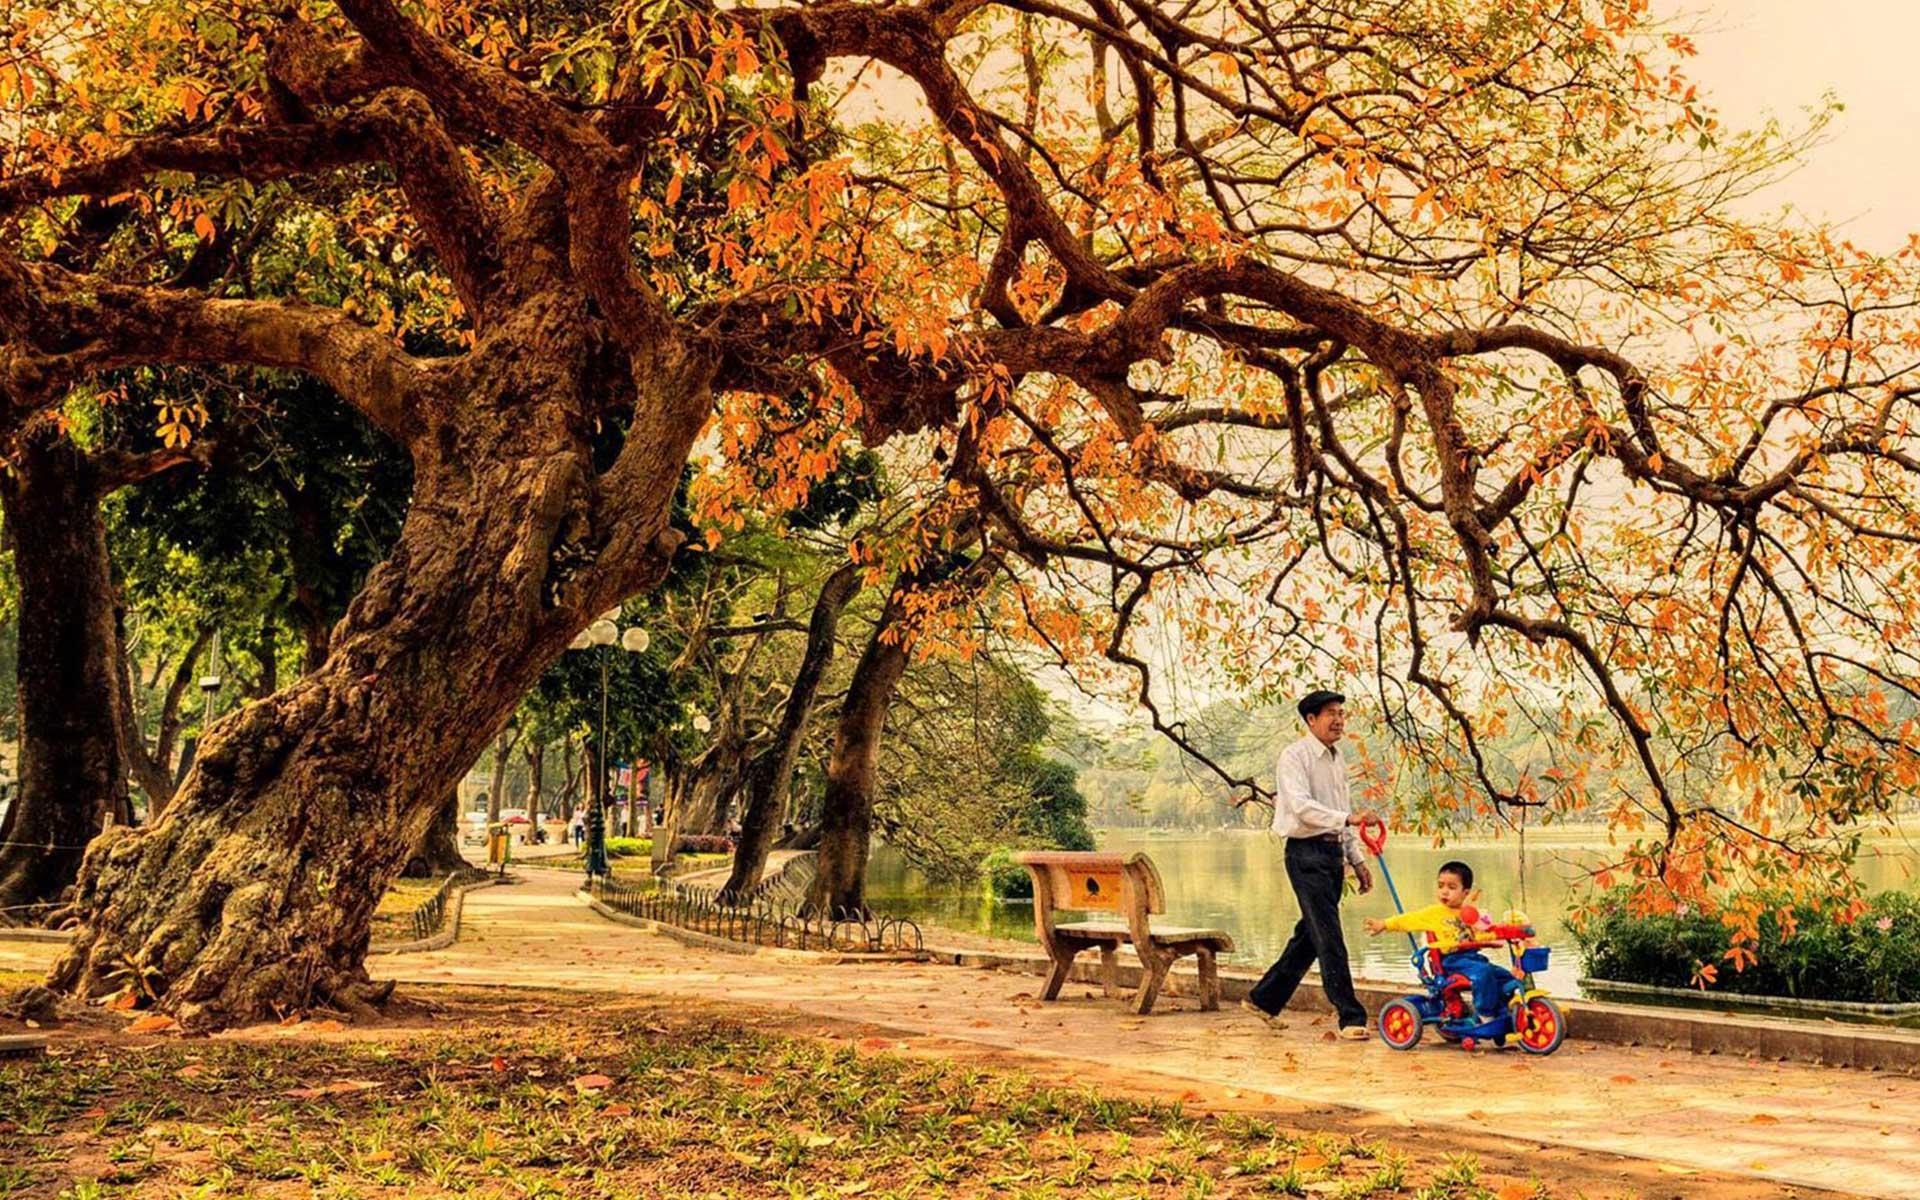 Autumn in Vietnam